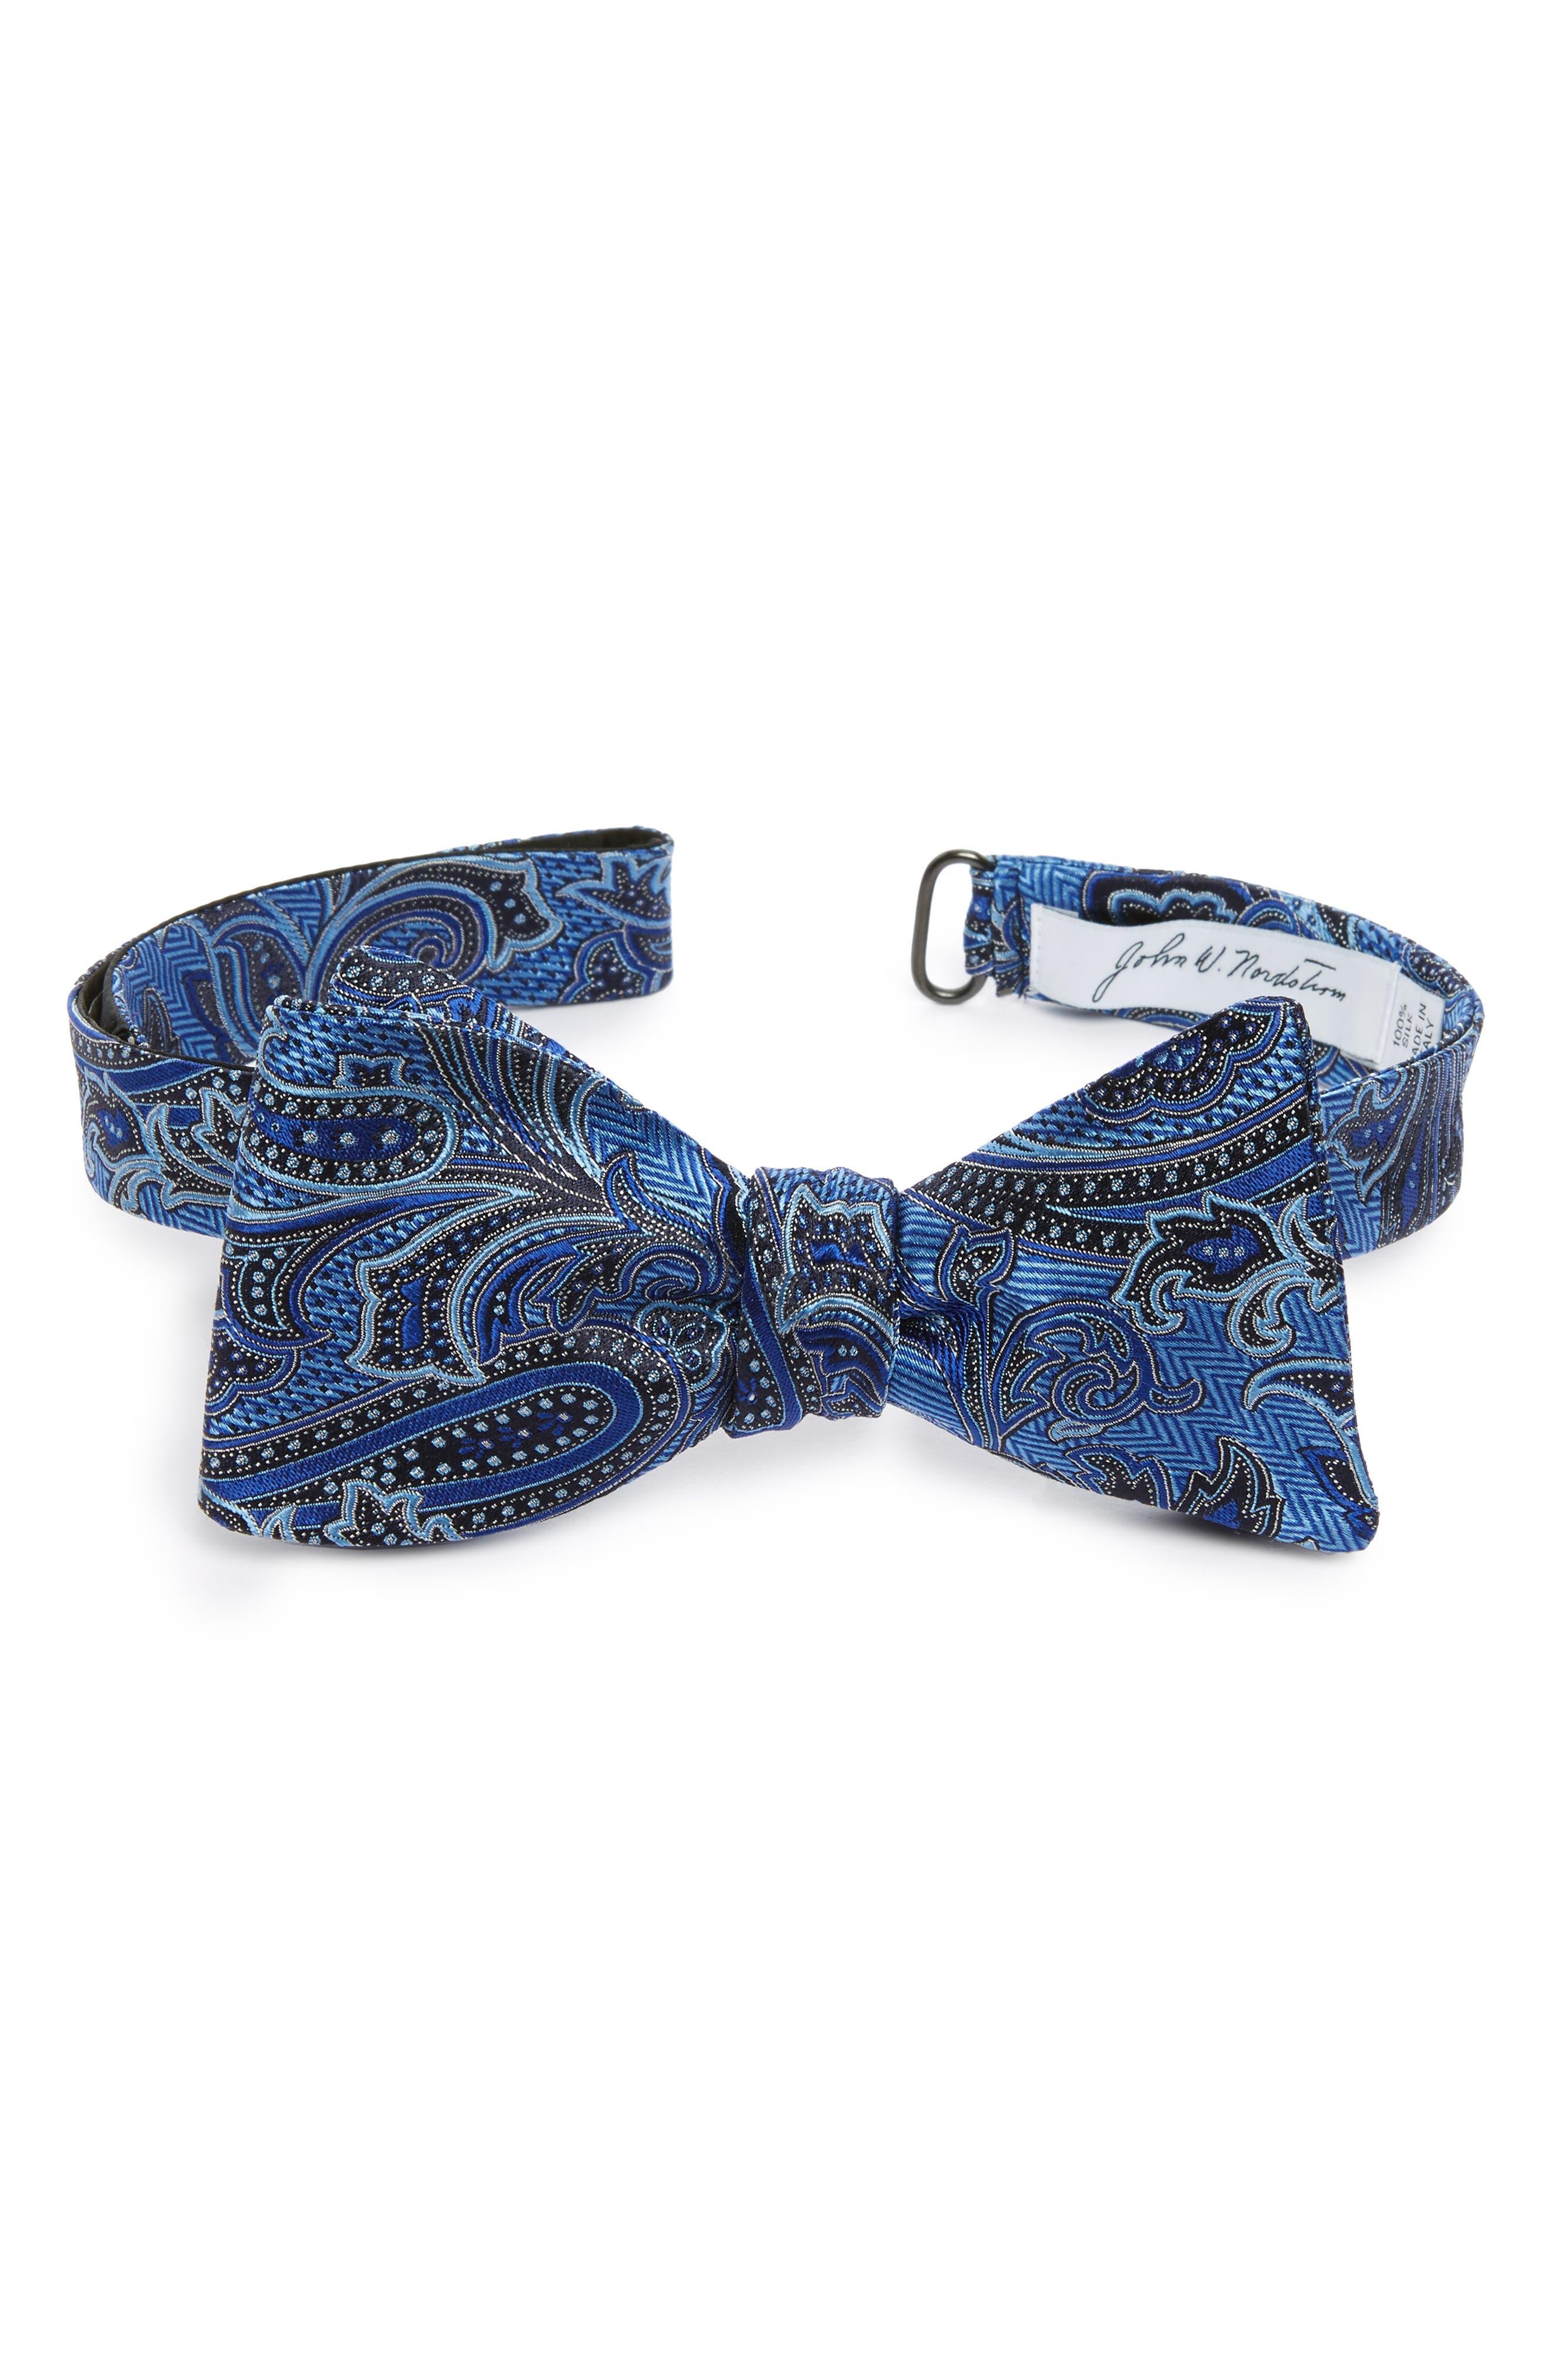 Paisley Silk Bow Tie,                             Main thumbnail 1, color,                             400